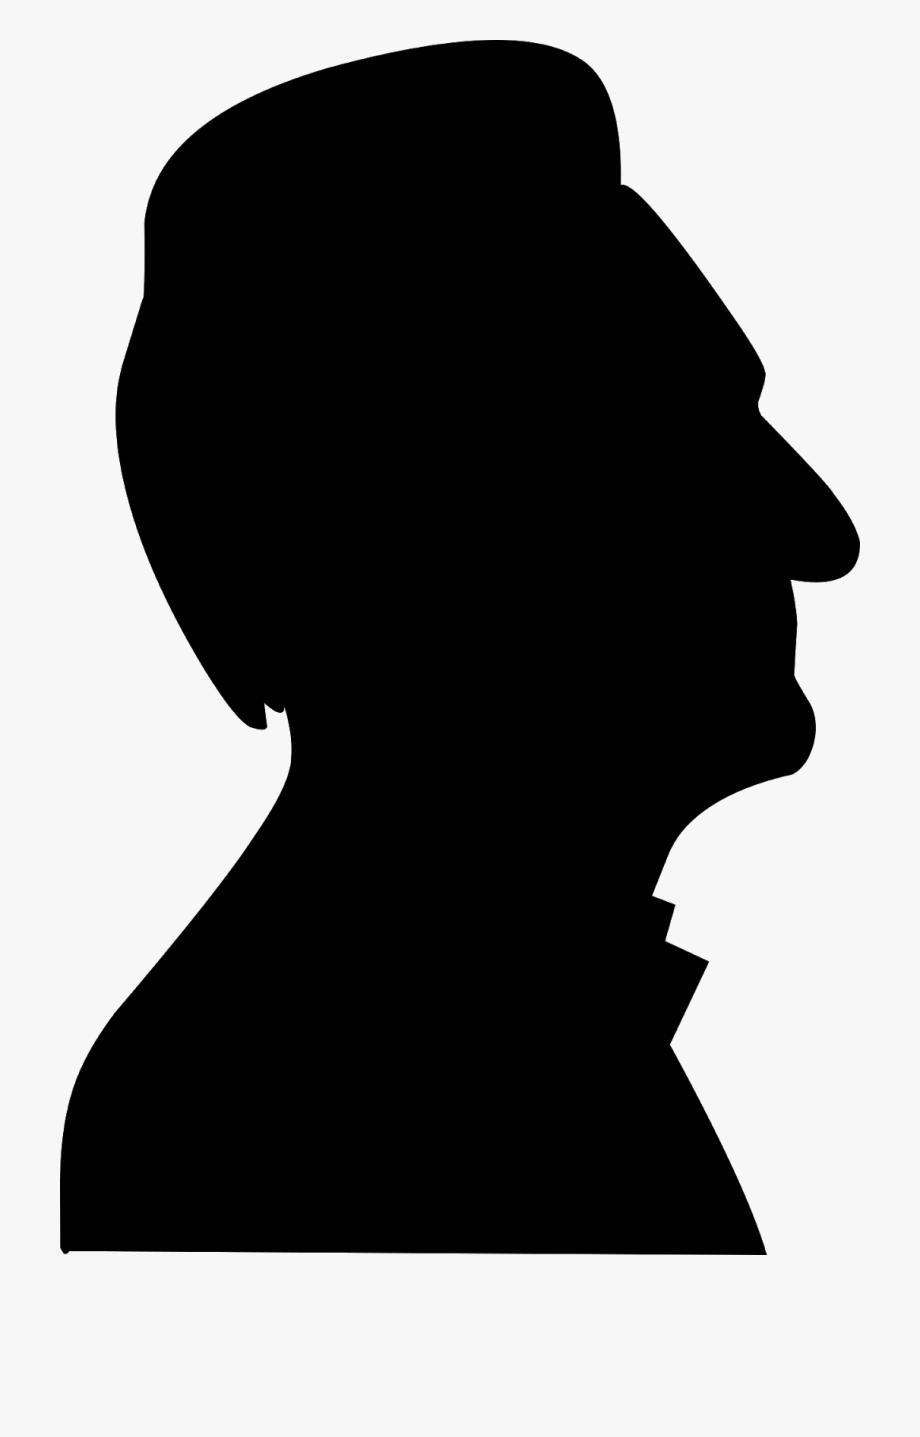 Elder, Face, Silhouette, Male, Man, Adult, Age, Alone,.